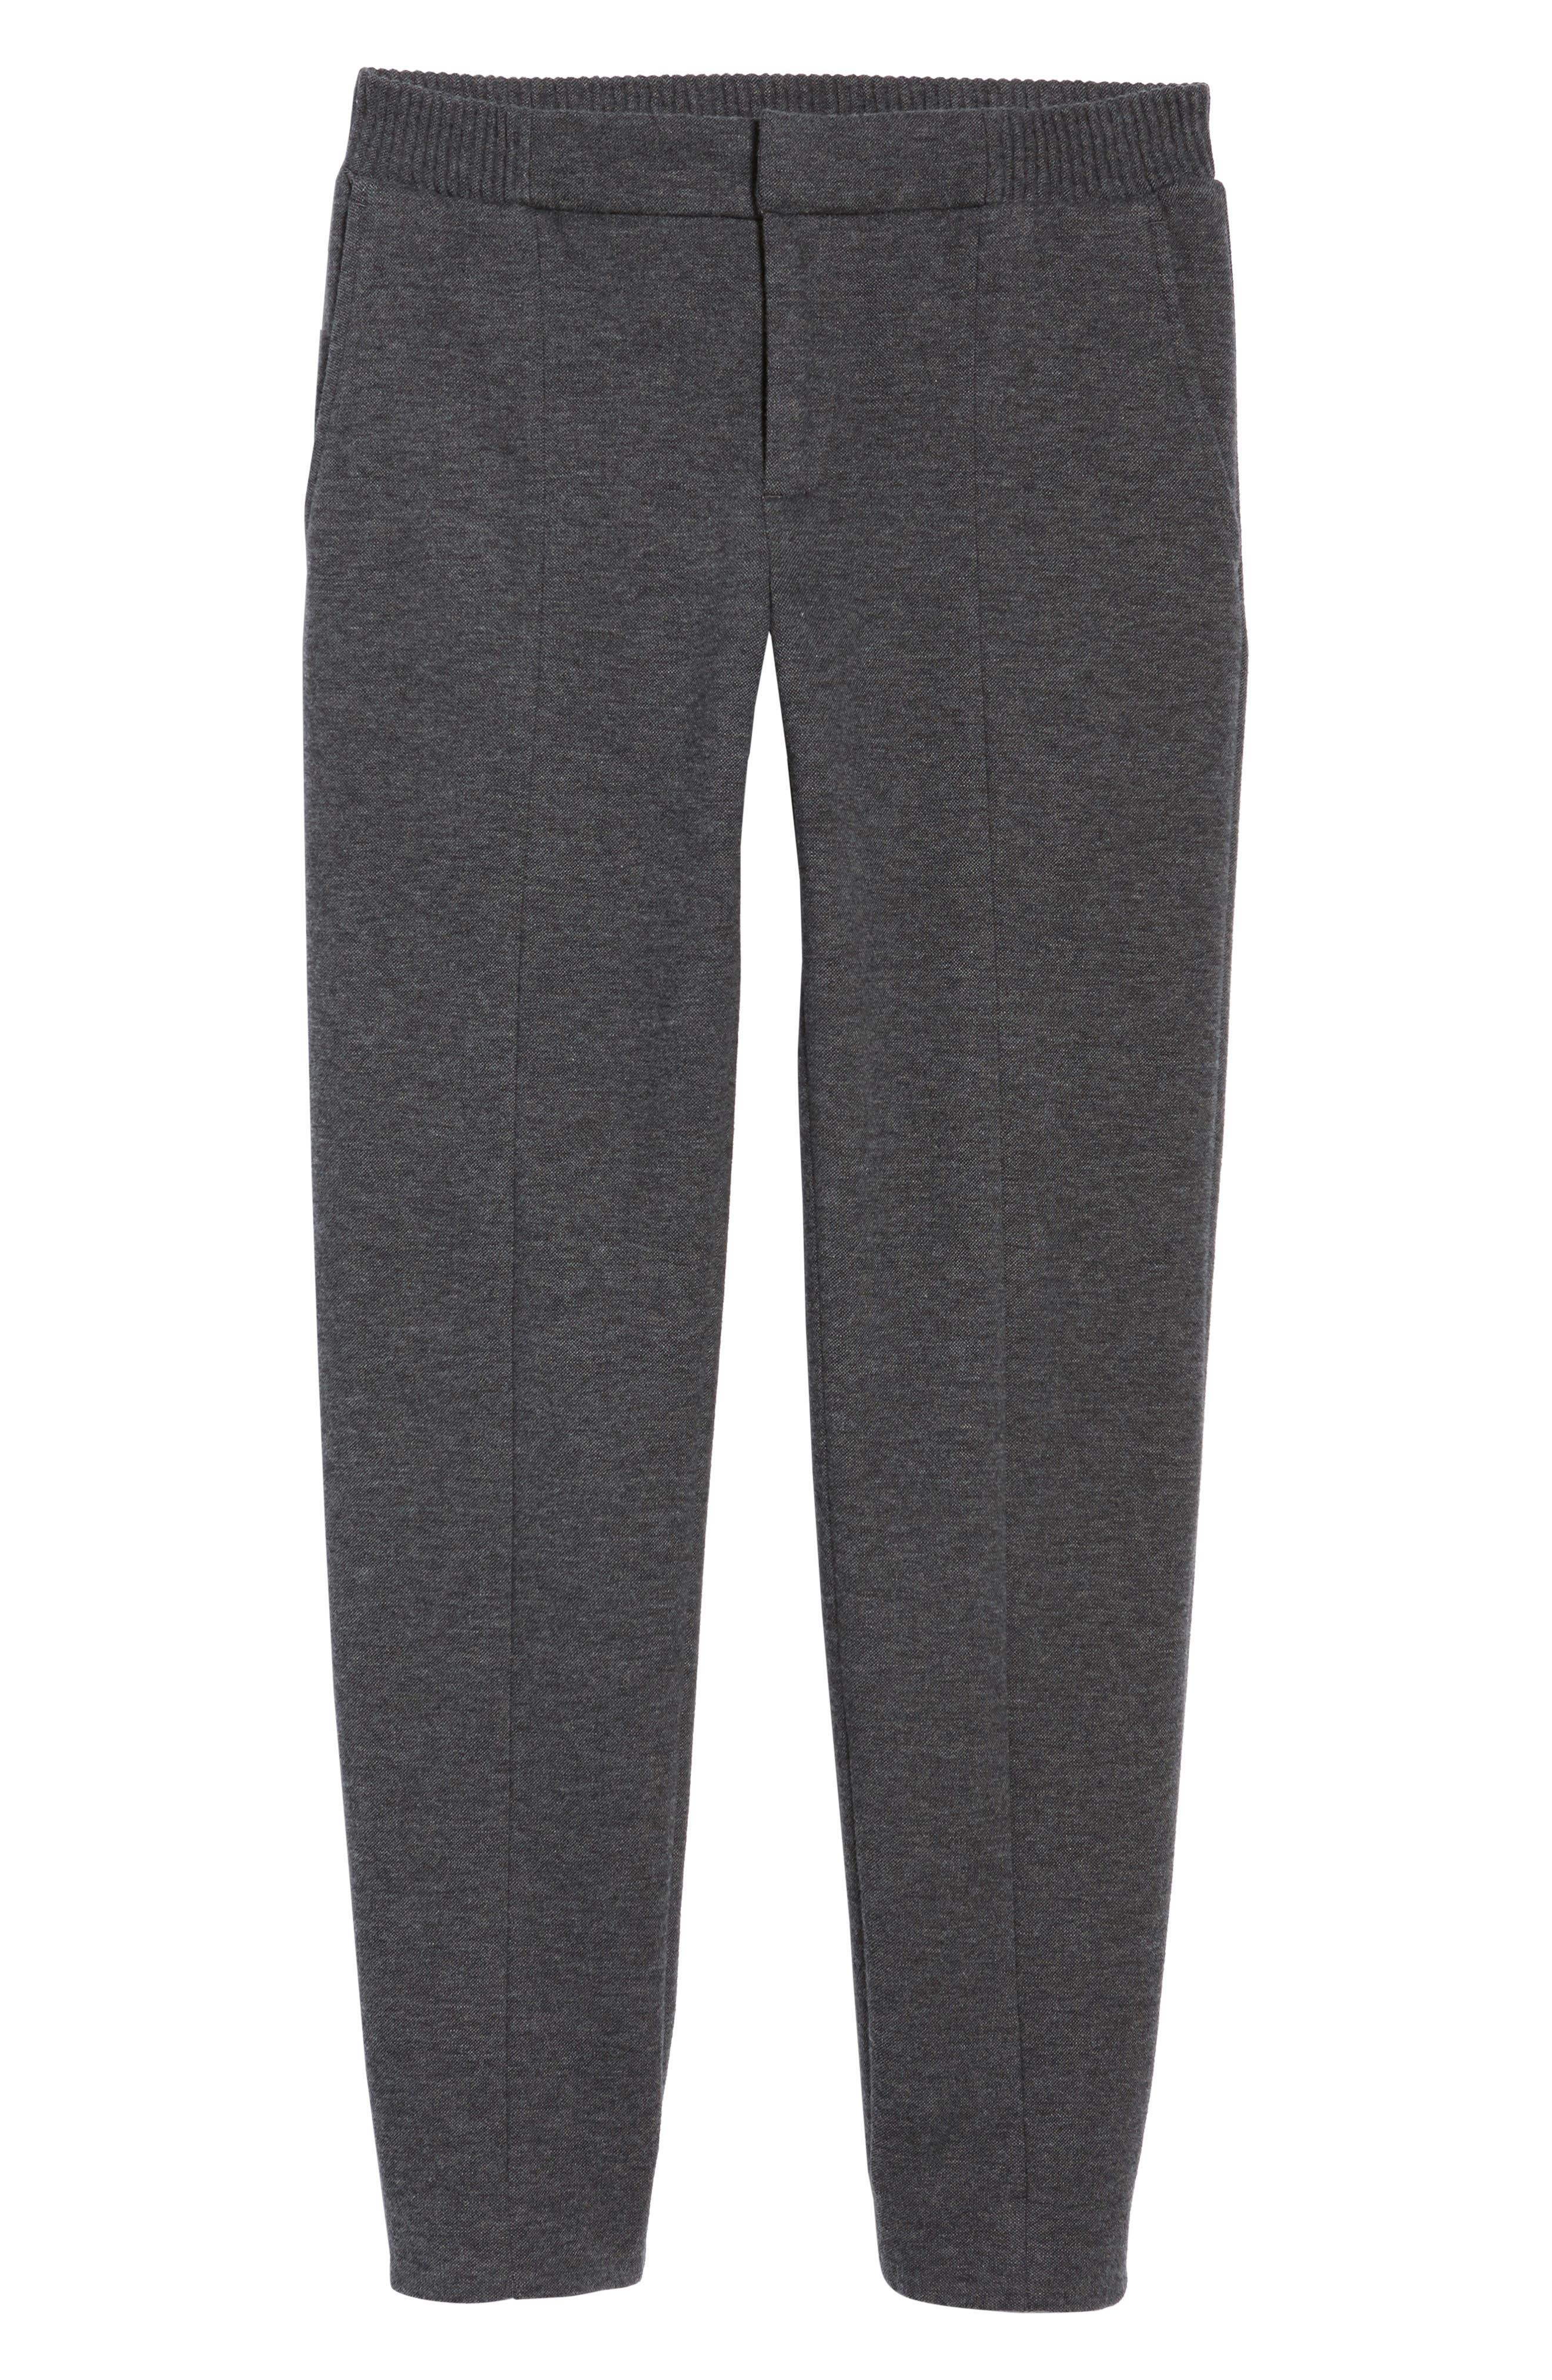 Jordan Flat Front Cotton Jogger Trousers,                             Alternate thumbnail 6, color,                             Medium Grey